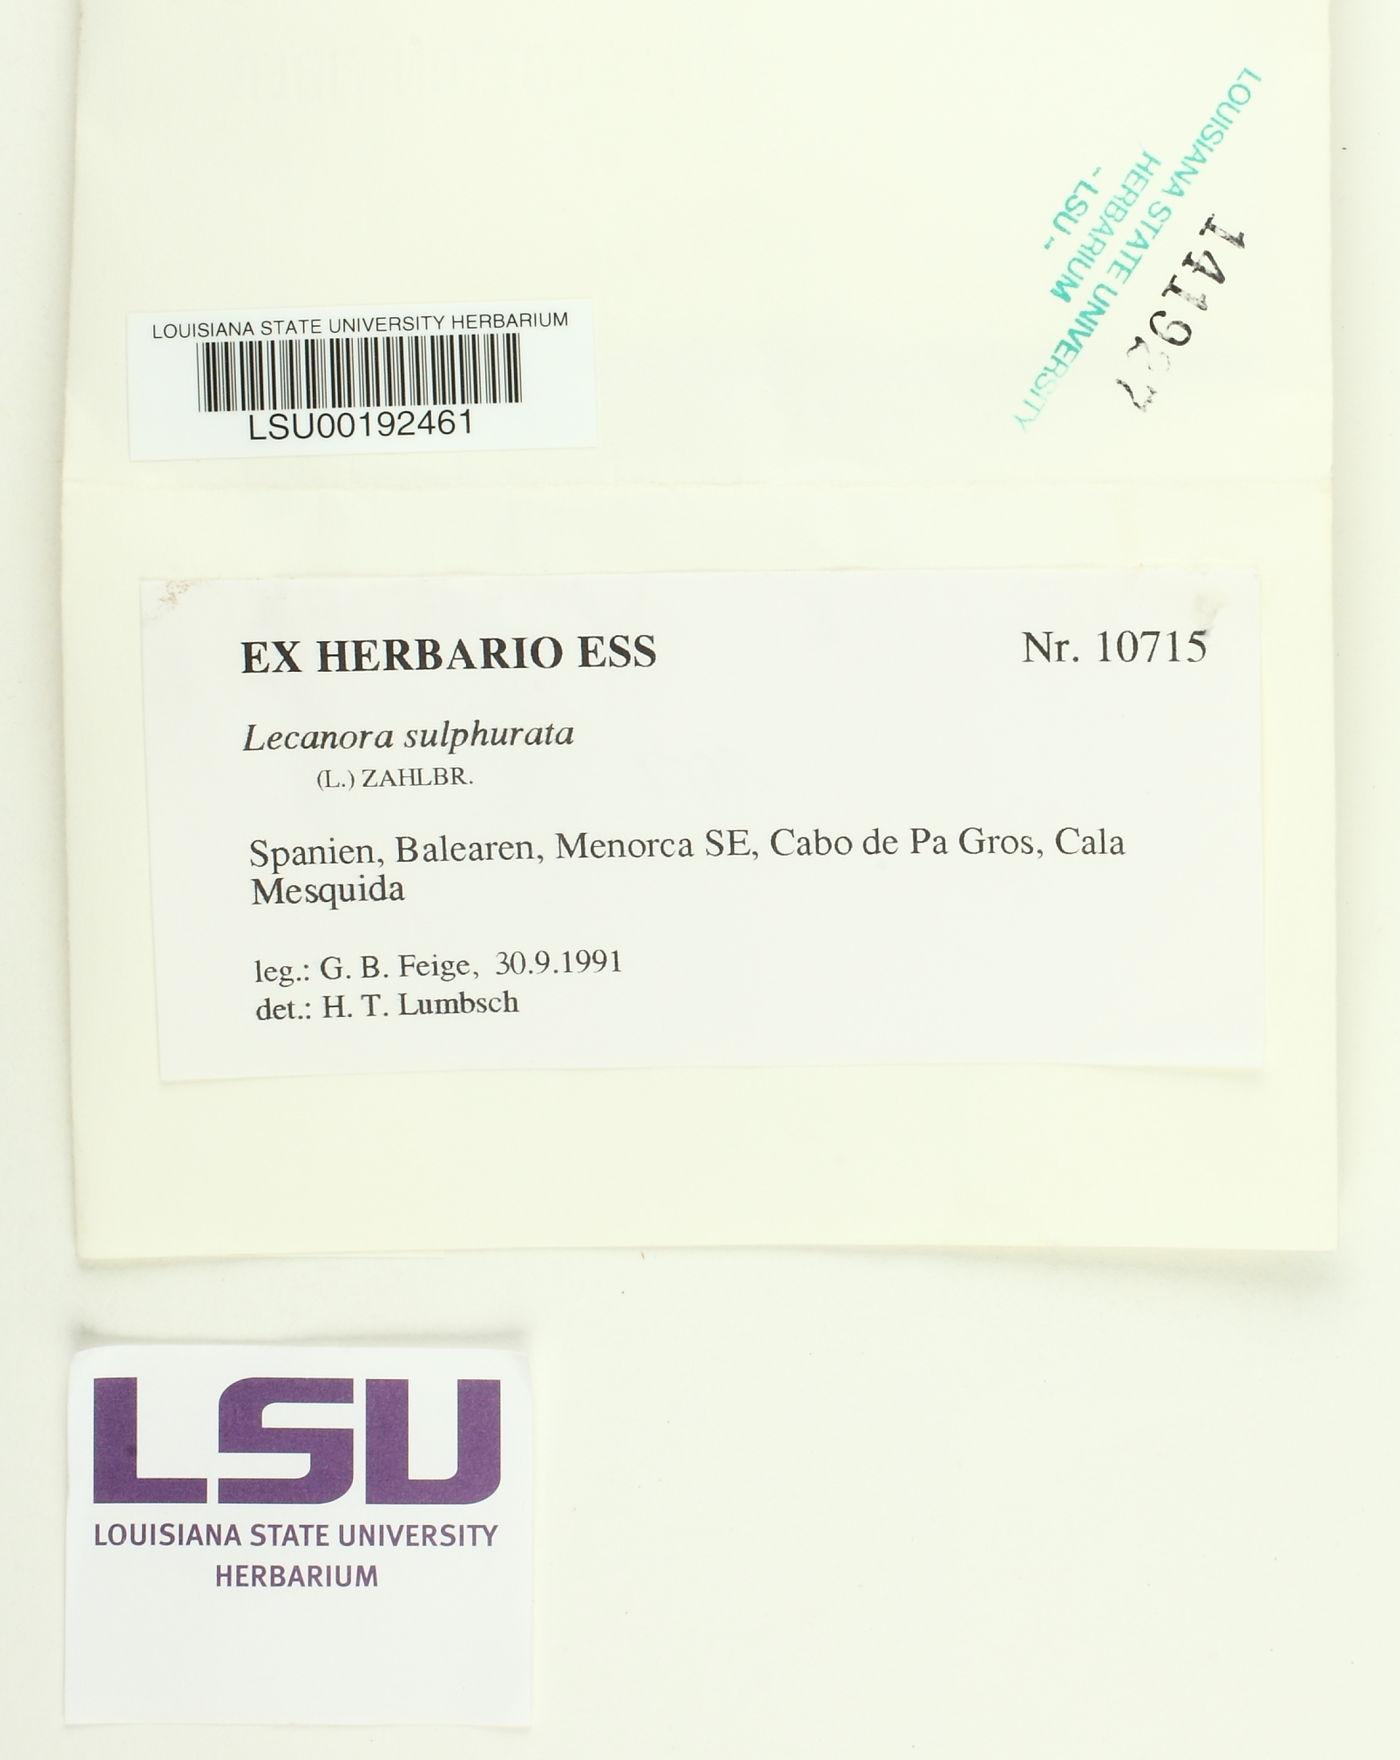 Lecanora sulphurata image